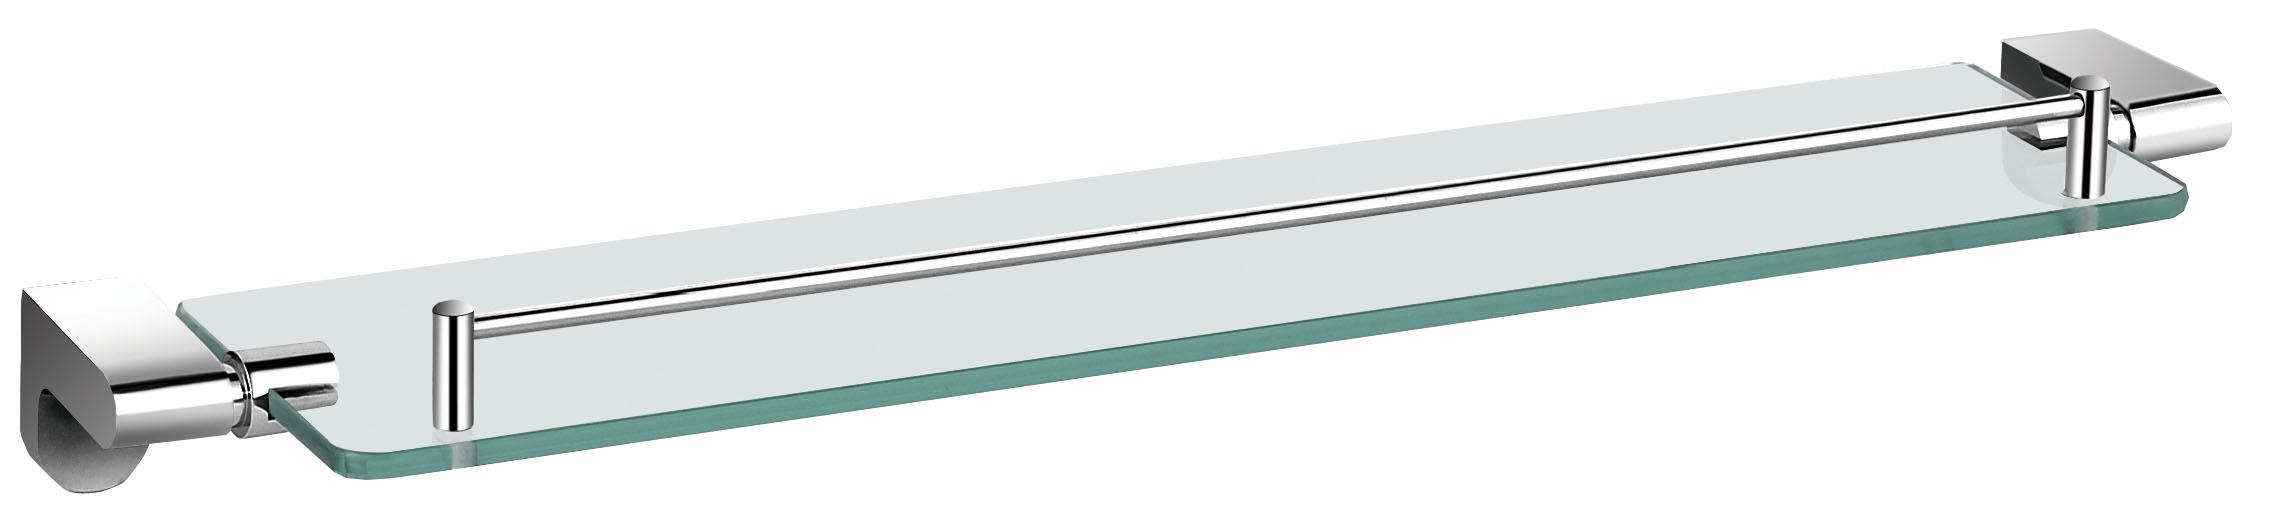 R-1400